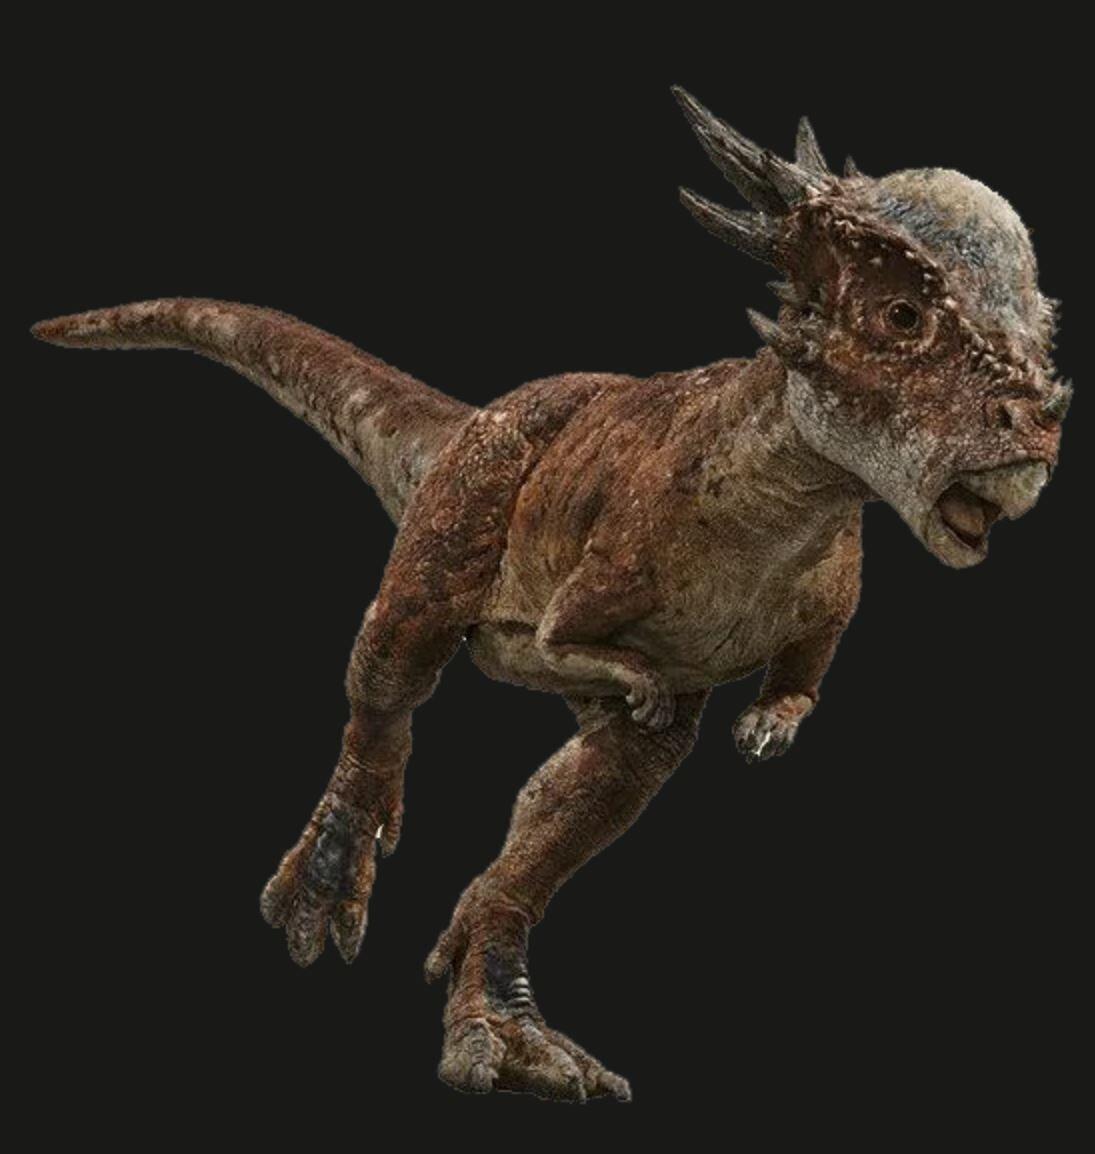 Stygimoloch marketing images( found in the net)